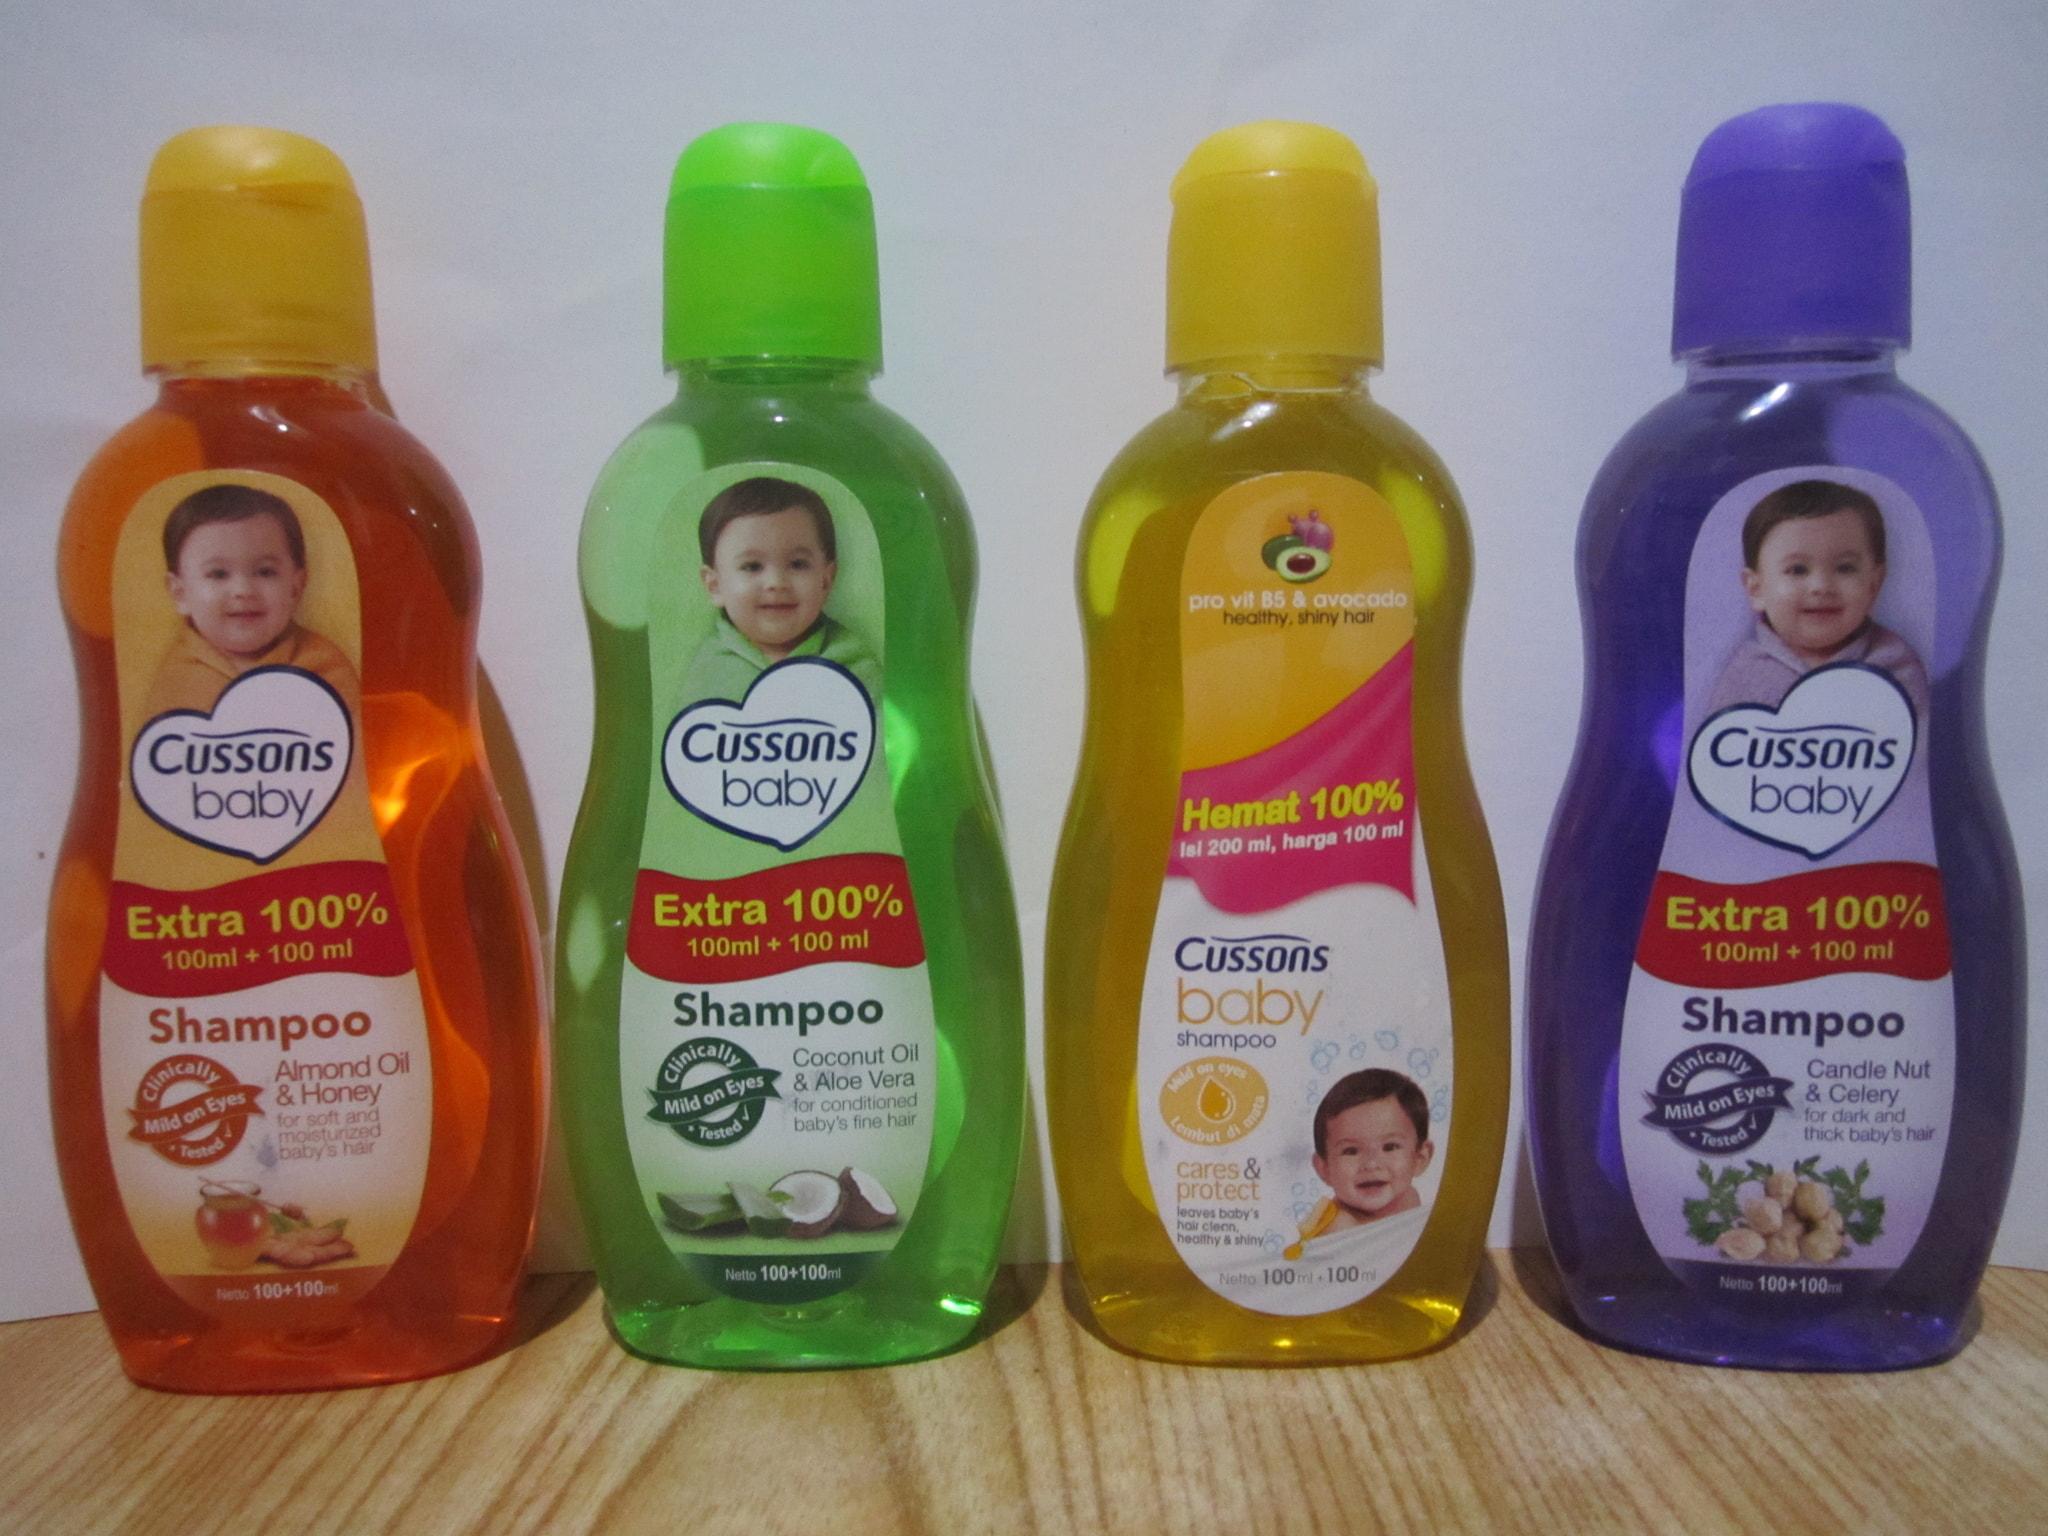 Jual Cussons Shampoo 100ml Extra Gudang Kosmetik Bogor Baby Coconut Oil And Aloe Vera 100 Ml Tokopedia